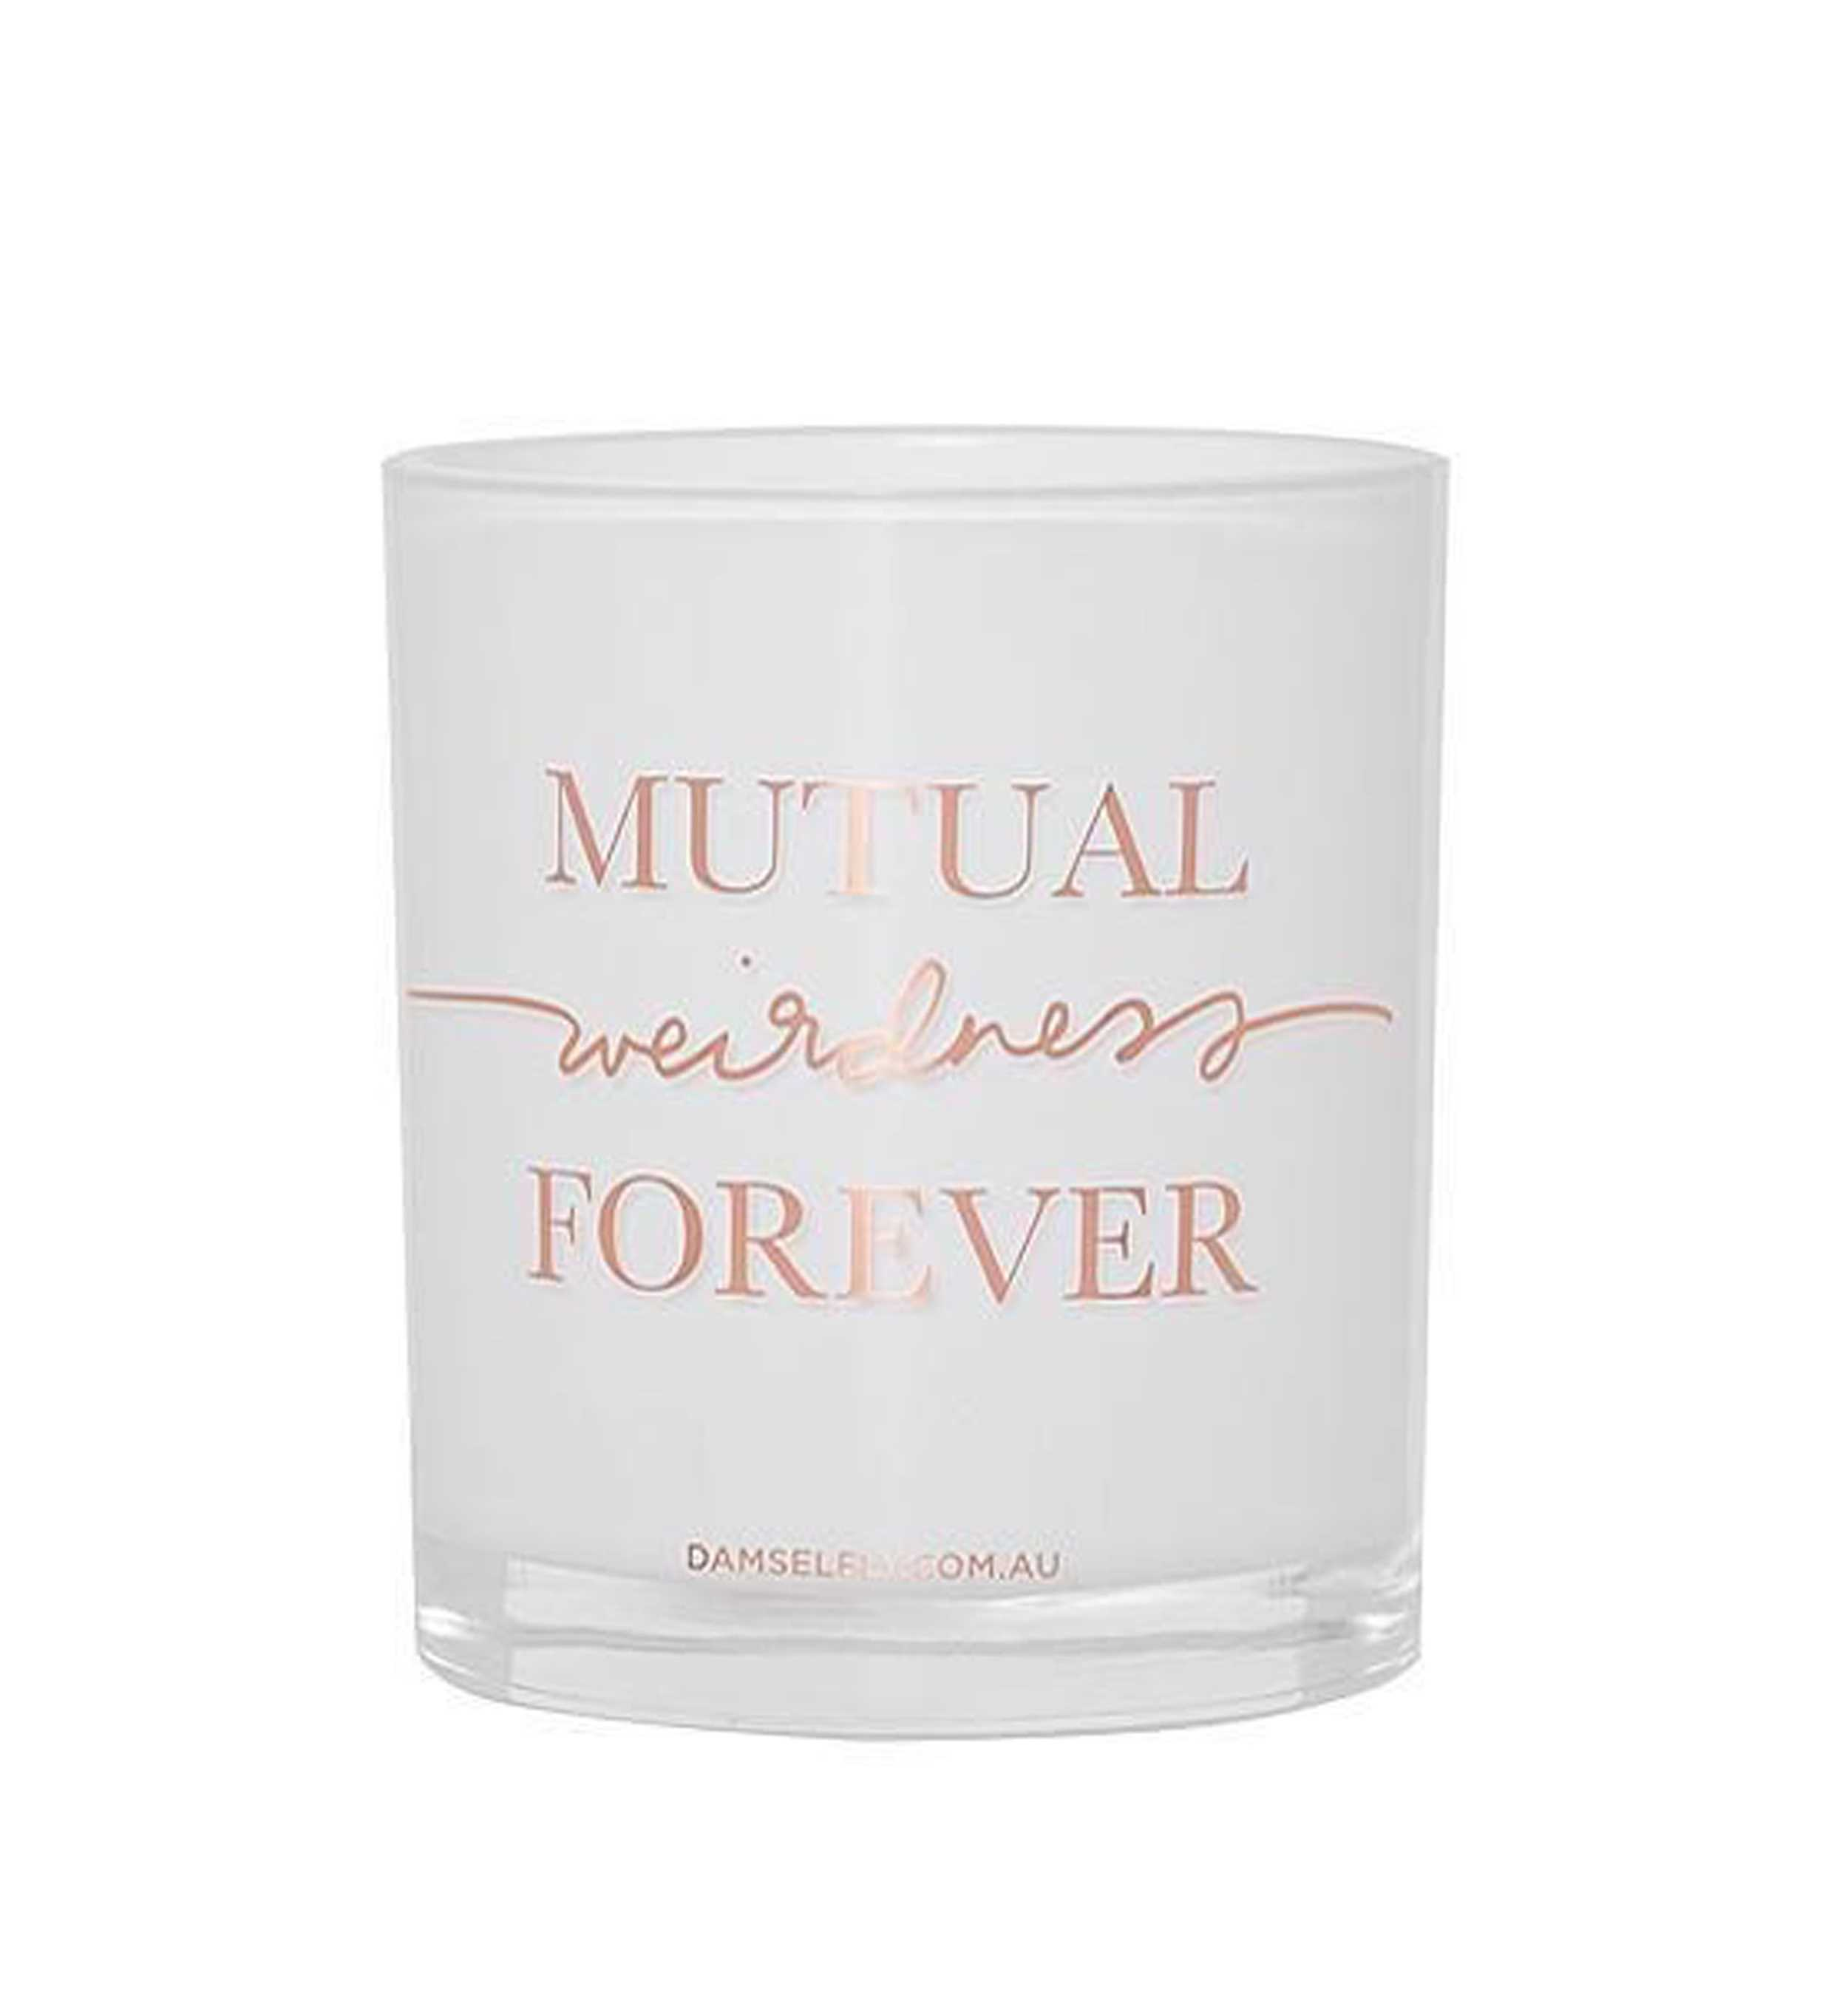 """Mutual Weirdness Forever""  Australia natural made, ""Love"" aromas candles 300g"